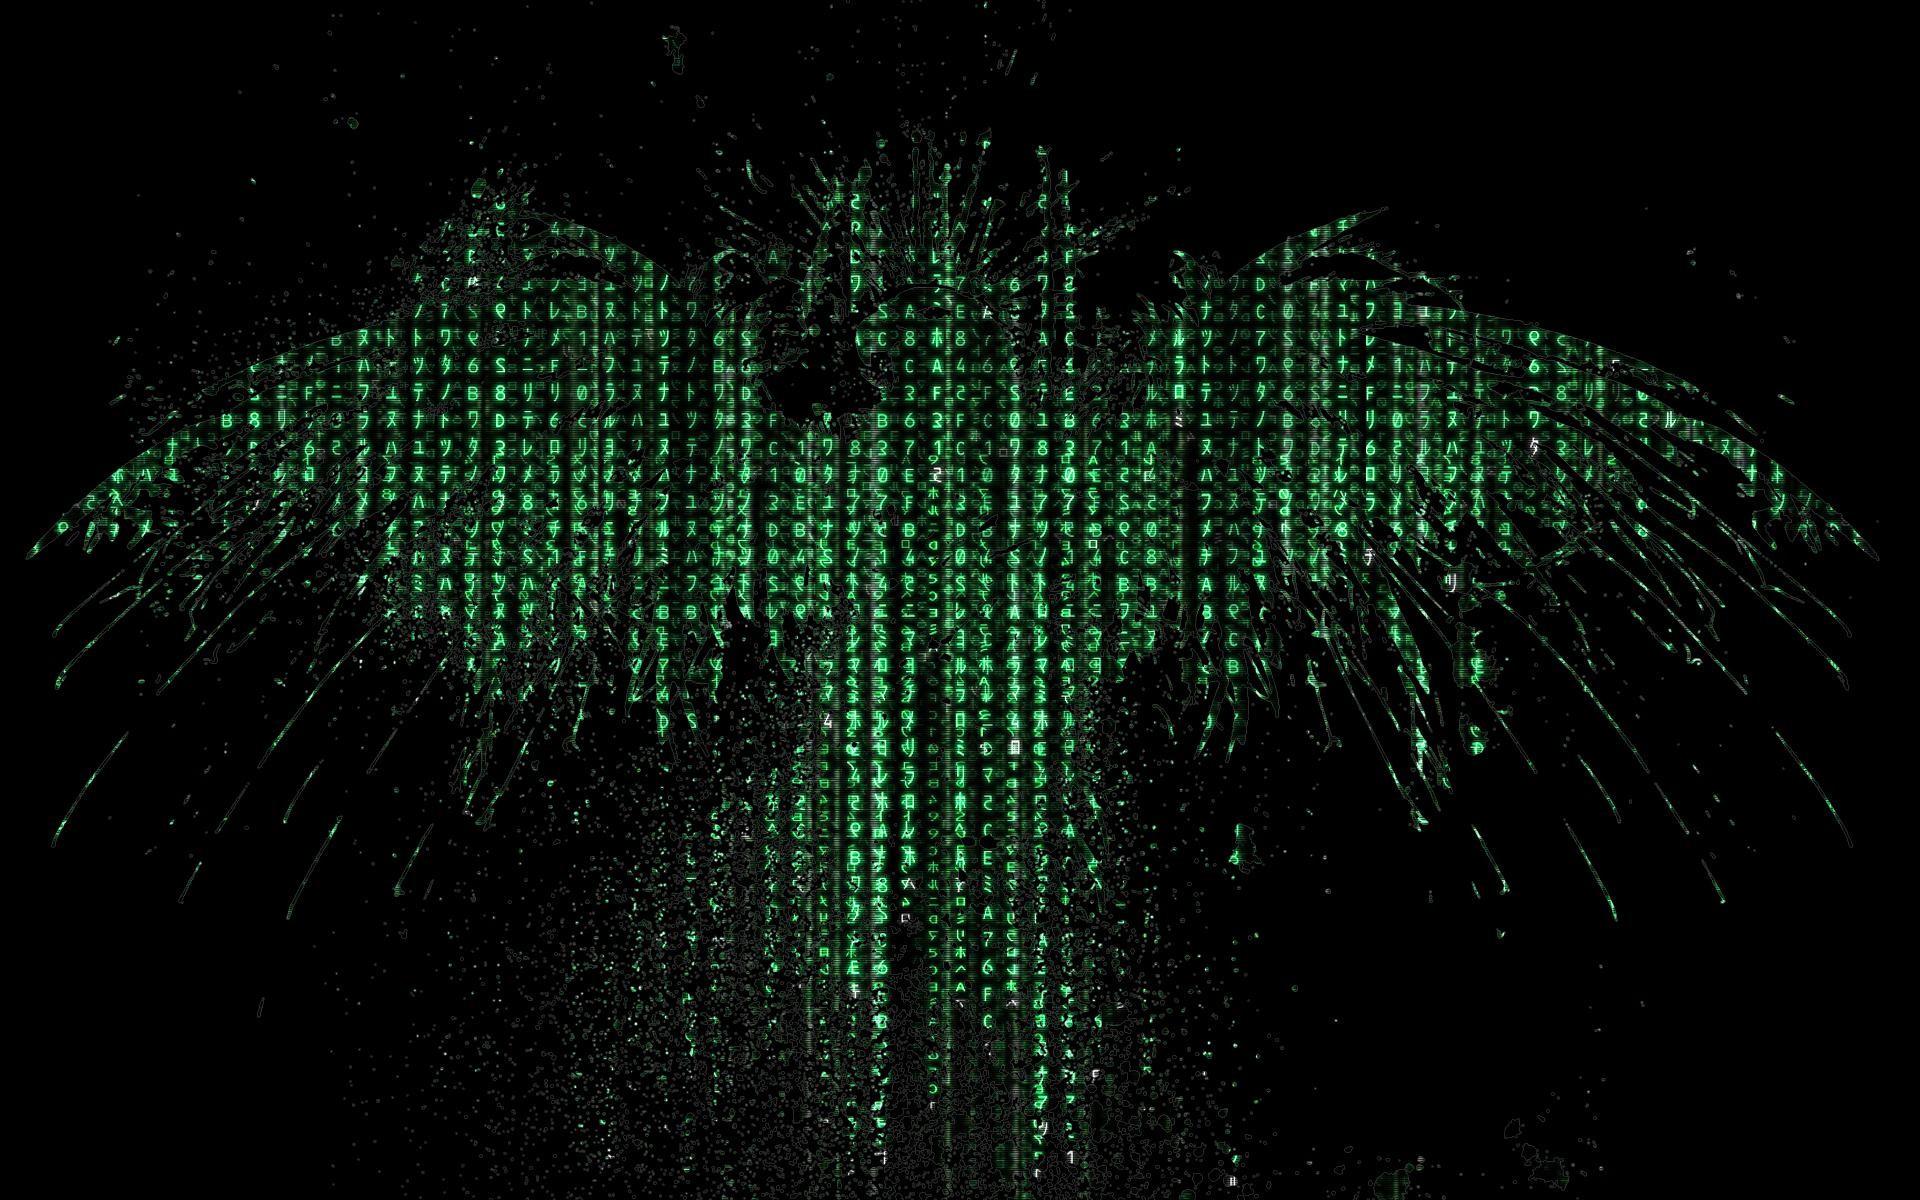 wallpaper.wiki-Animated-Matrix-Eagle-Background-PIC-WPC004913